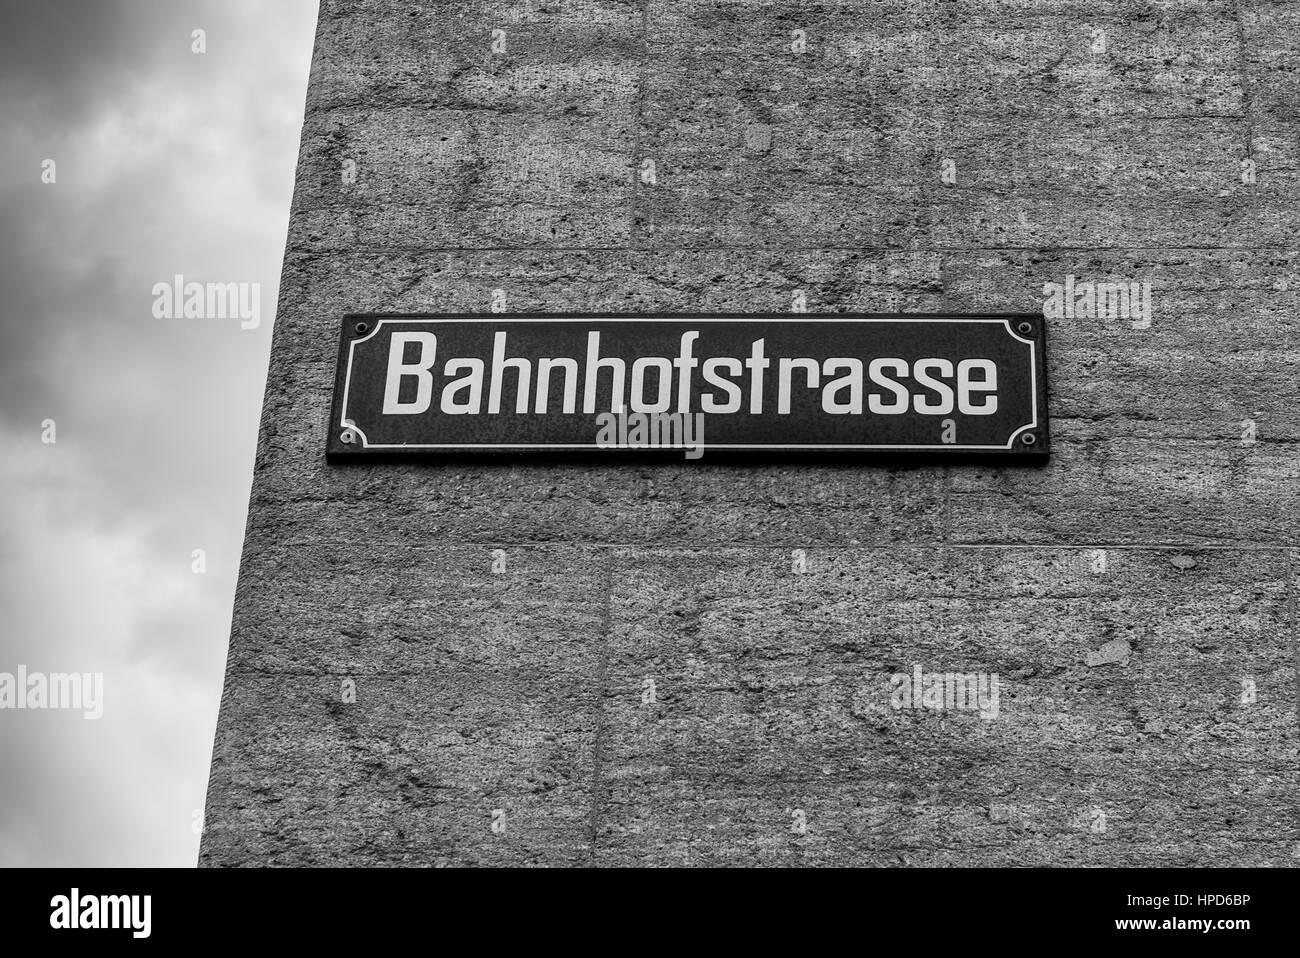 Bahnhofstrasse street plate in Zurich, Switzerland. Black and white photography. - Stock Image